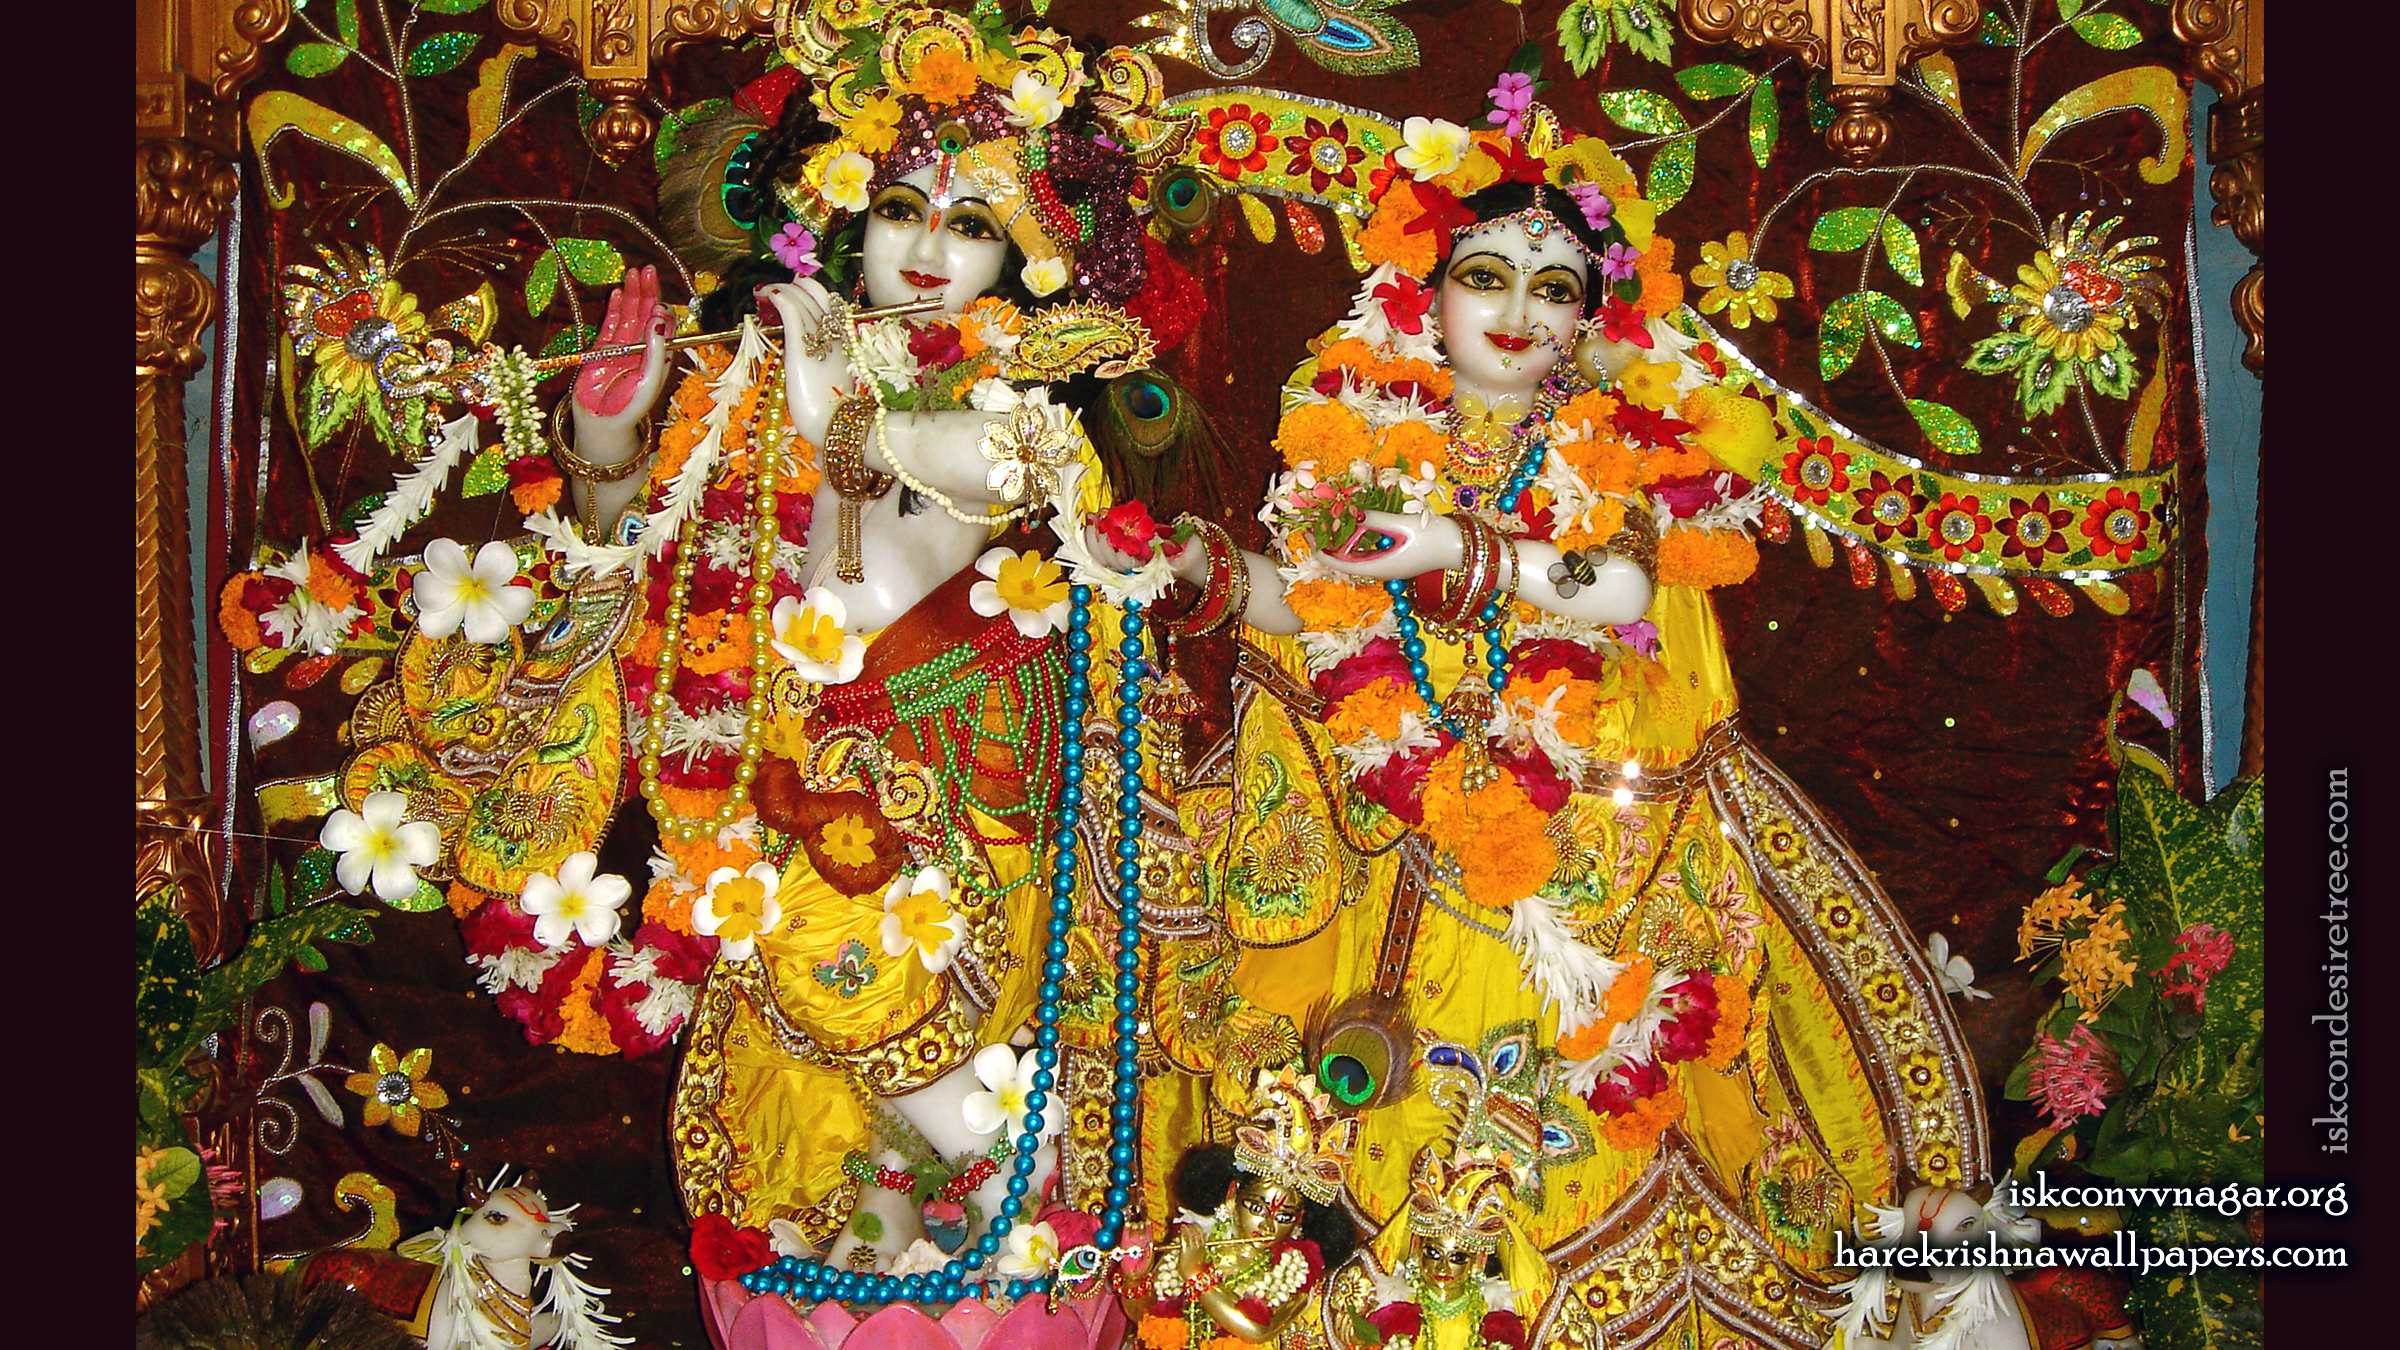 Sri Sri Radha Giridhari Wallpaper (006) Size 2400x1350 Download